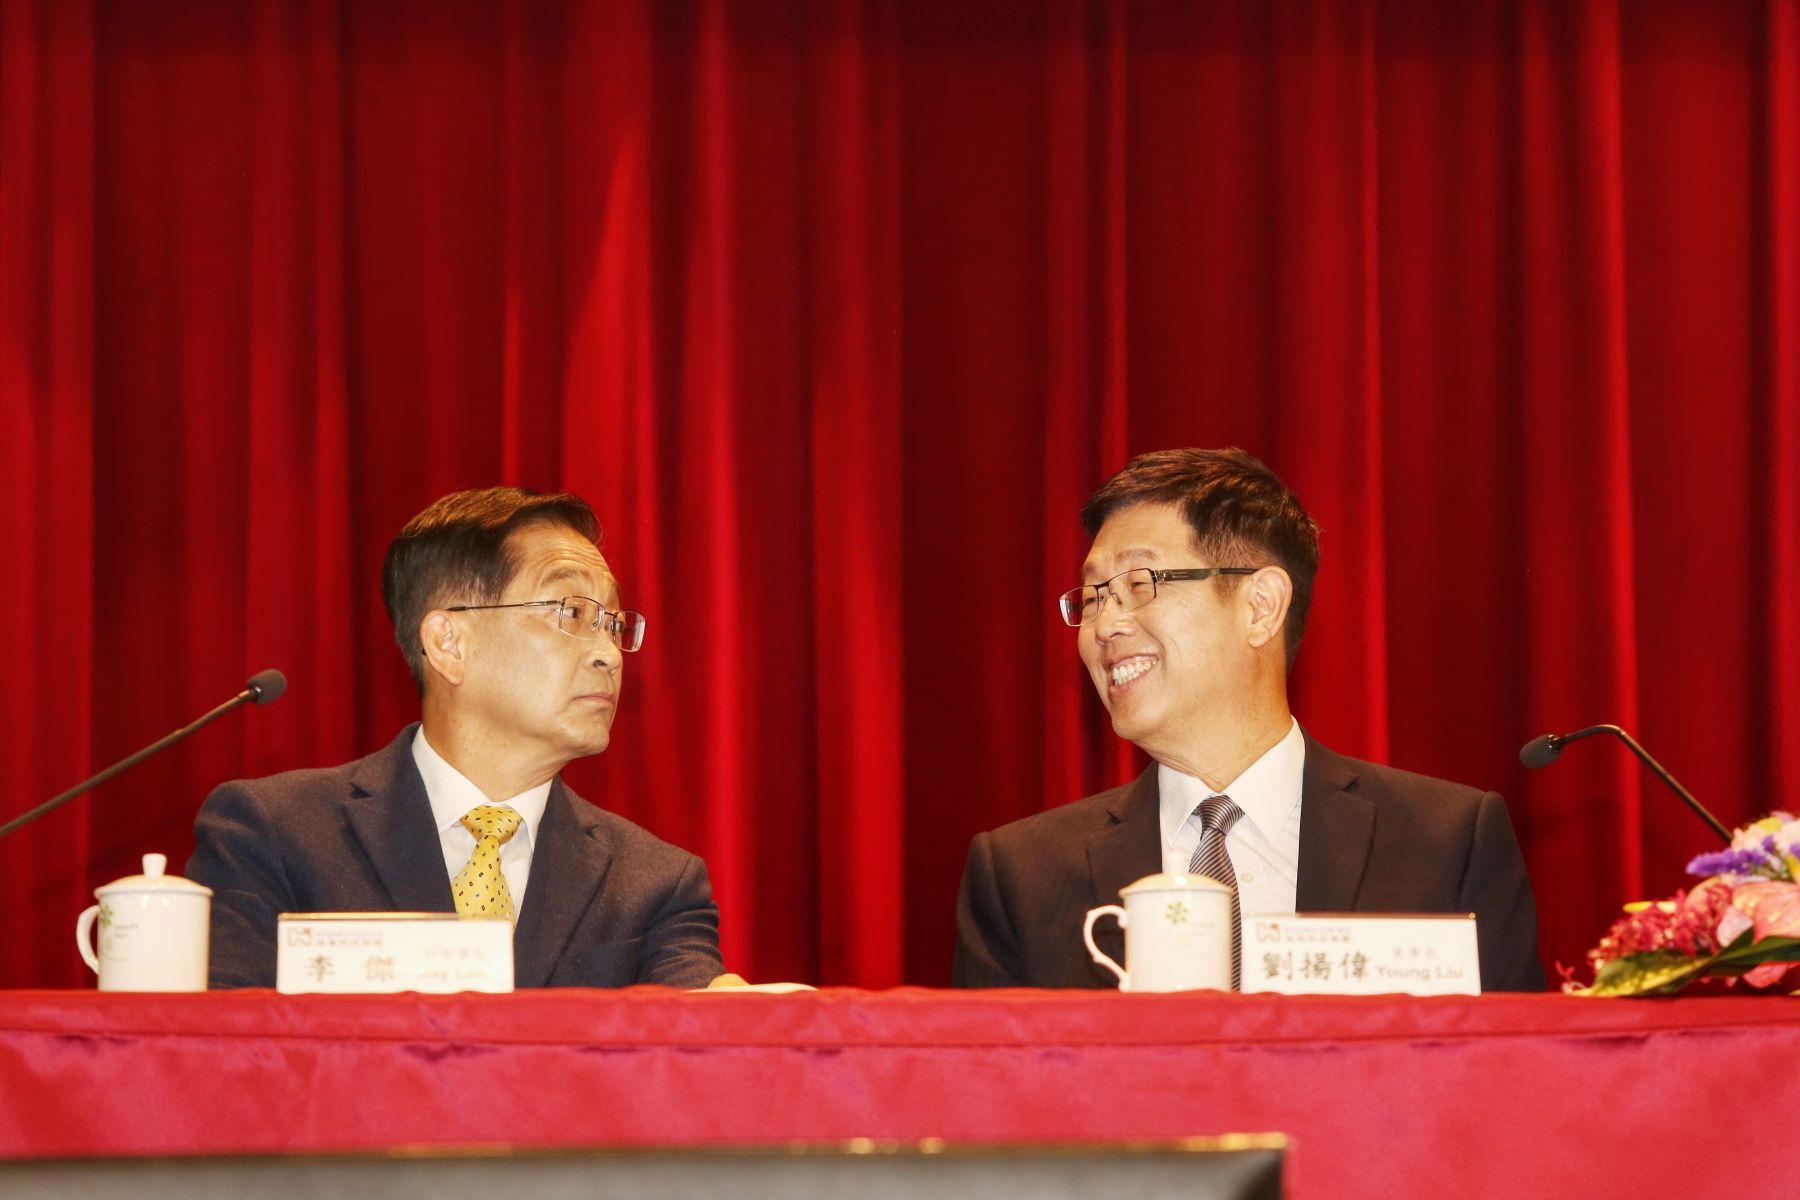 5G商機上看13兆元! 鴻海董座:不放棄機會 亞太電私募100億全包了